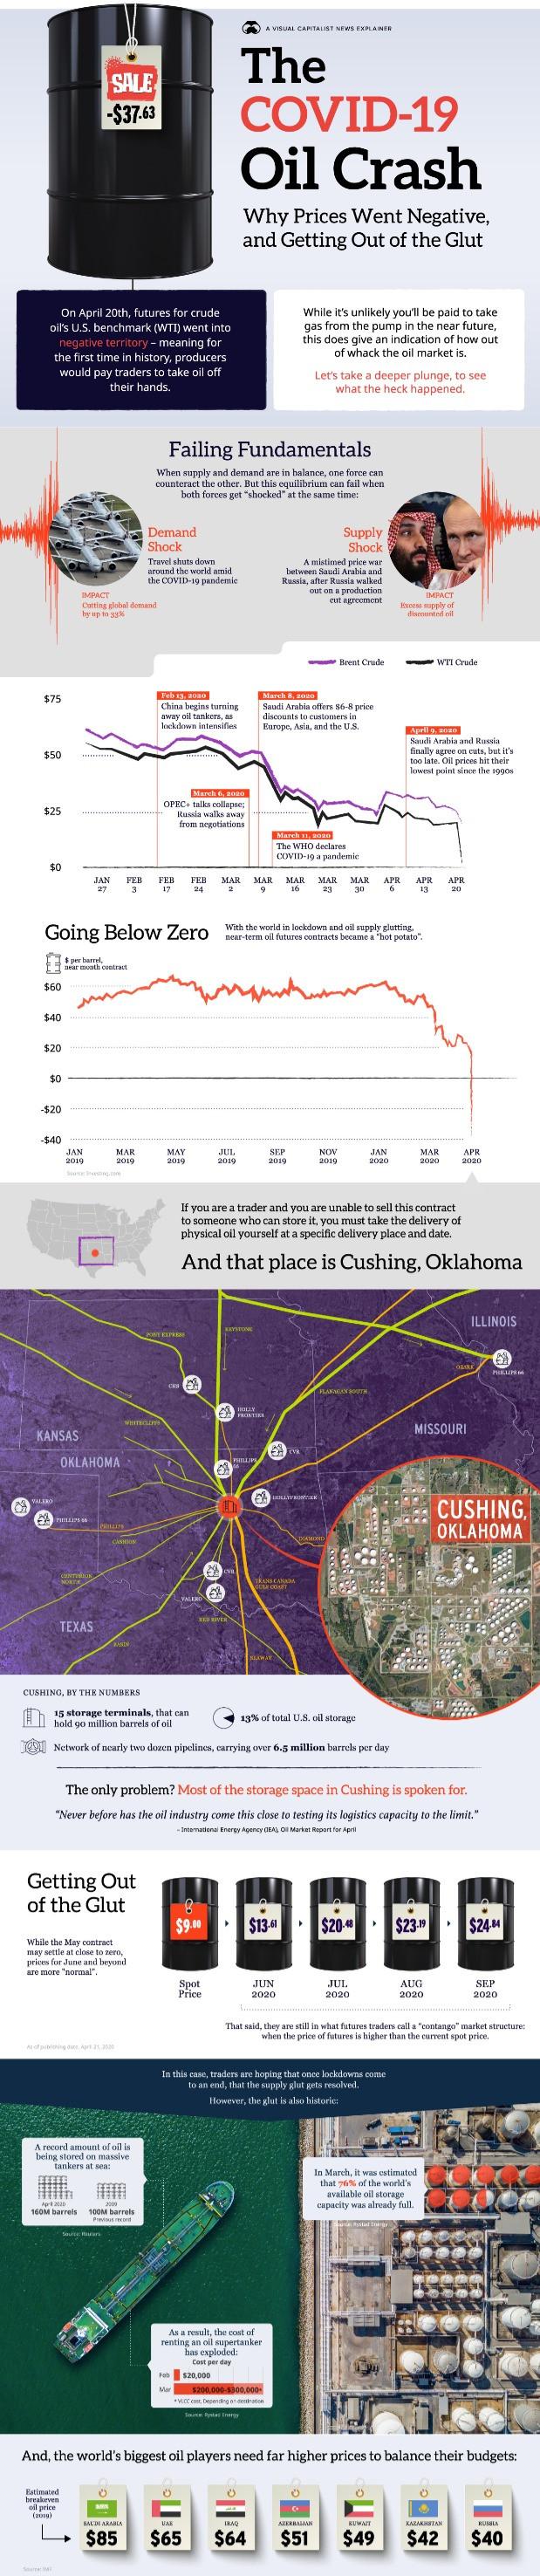 Oil Crash 2020 infographic